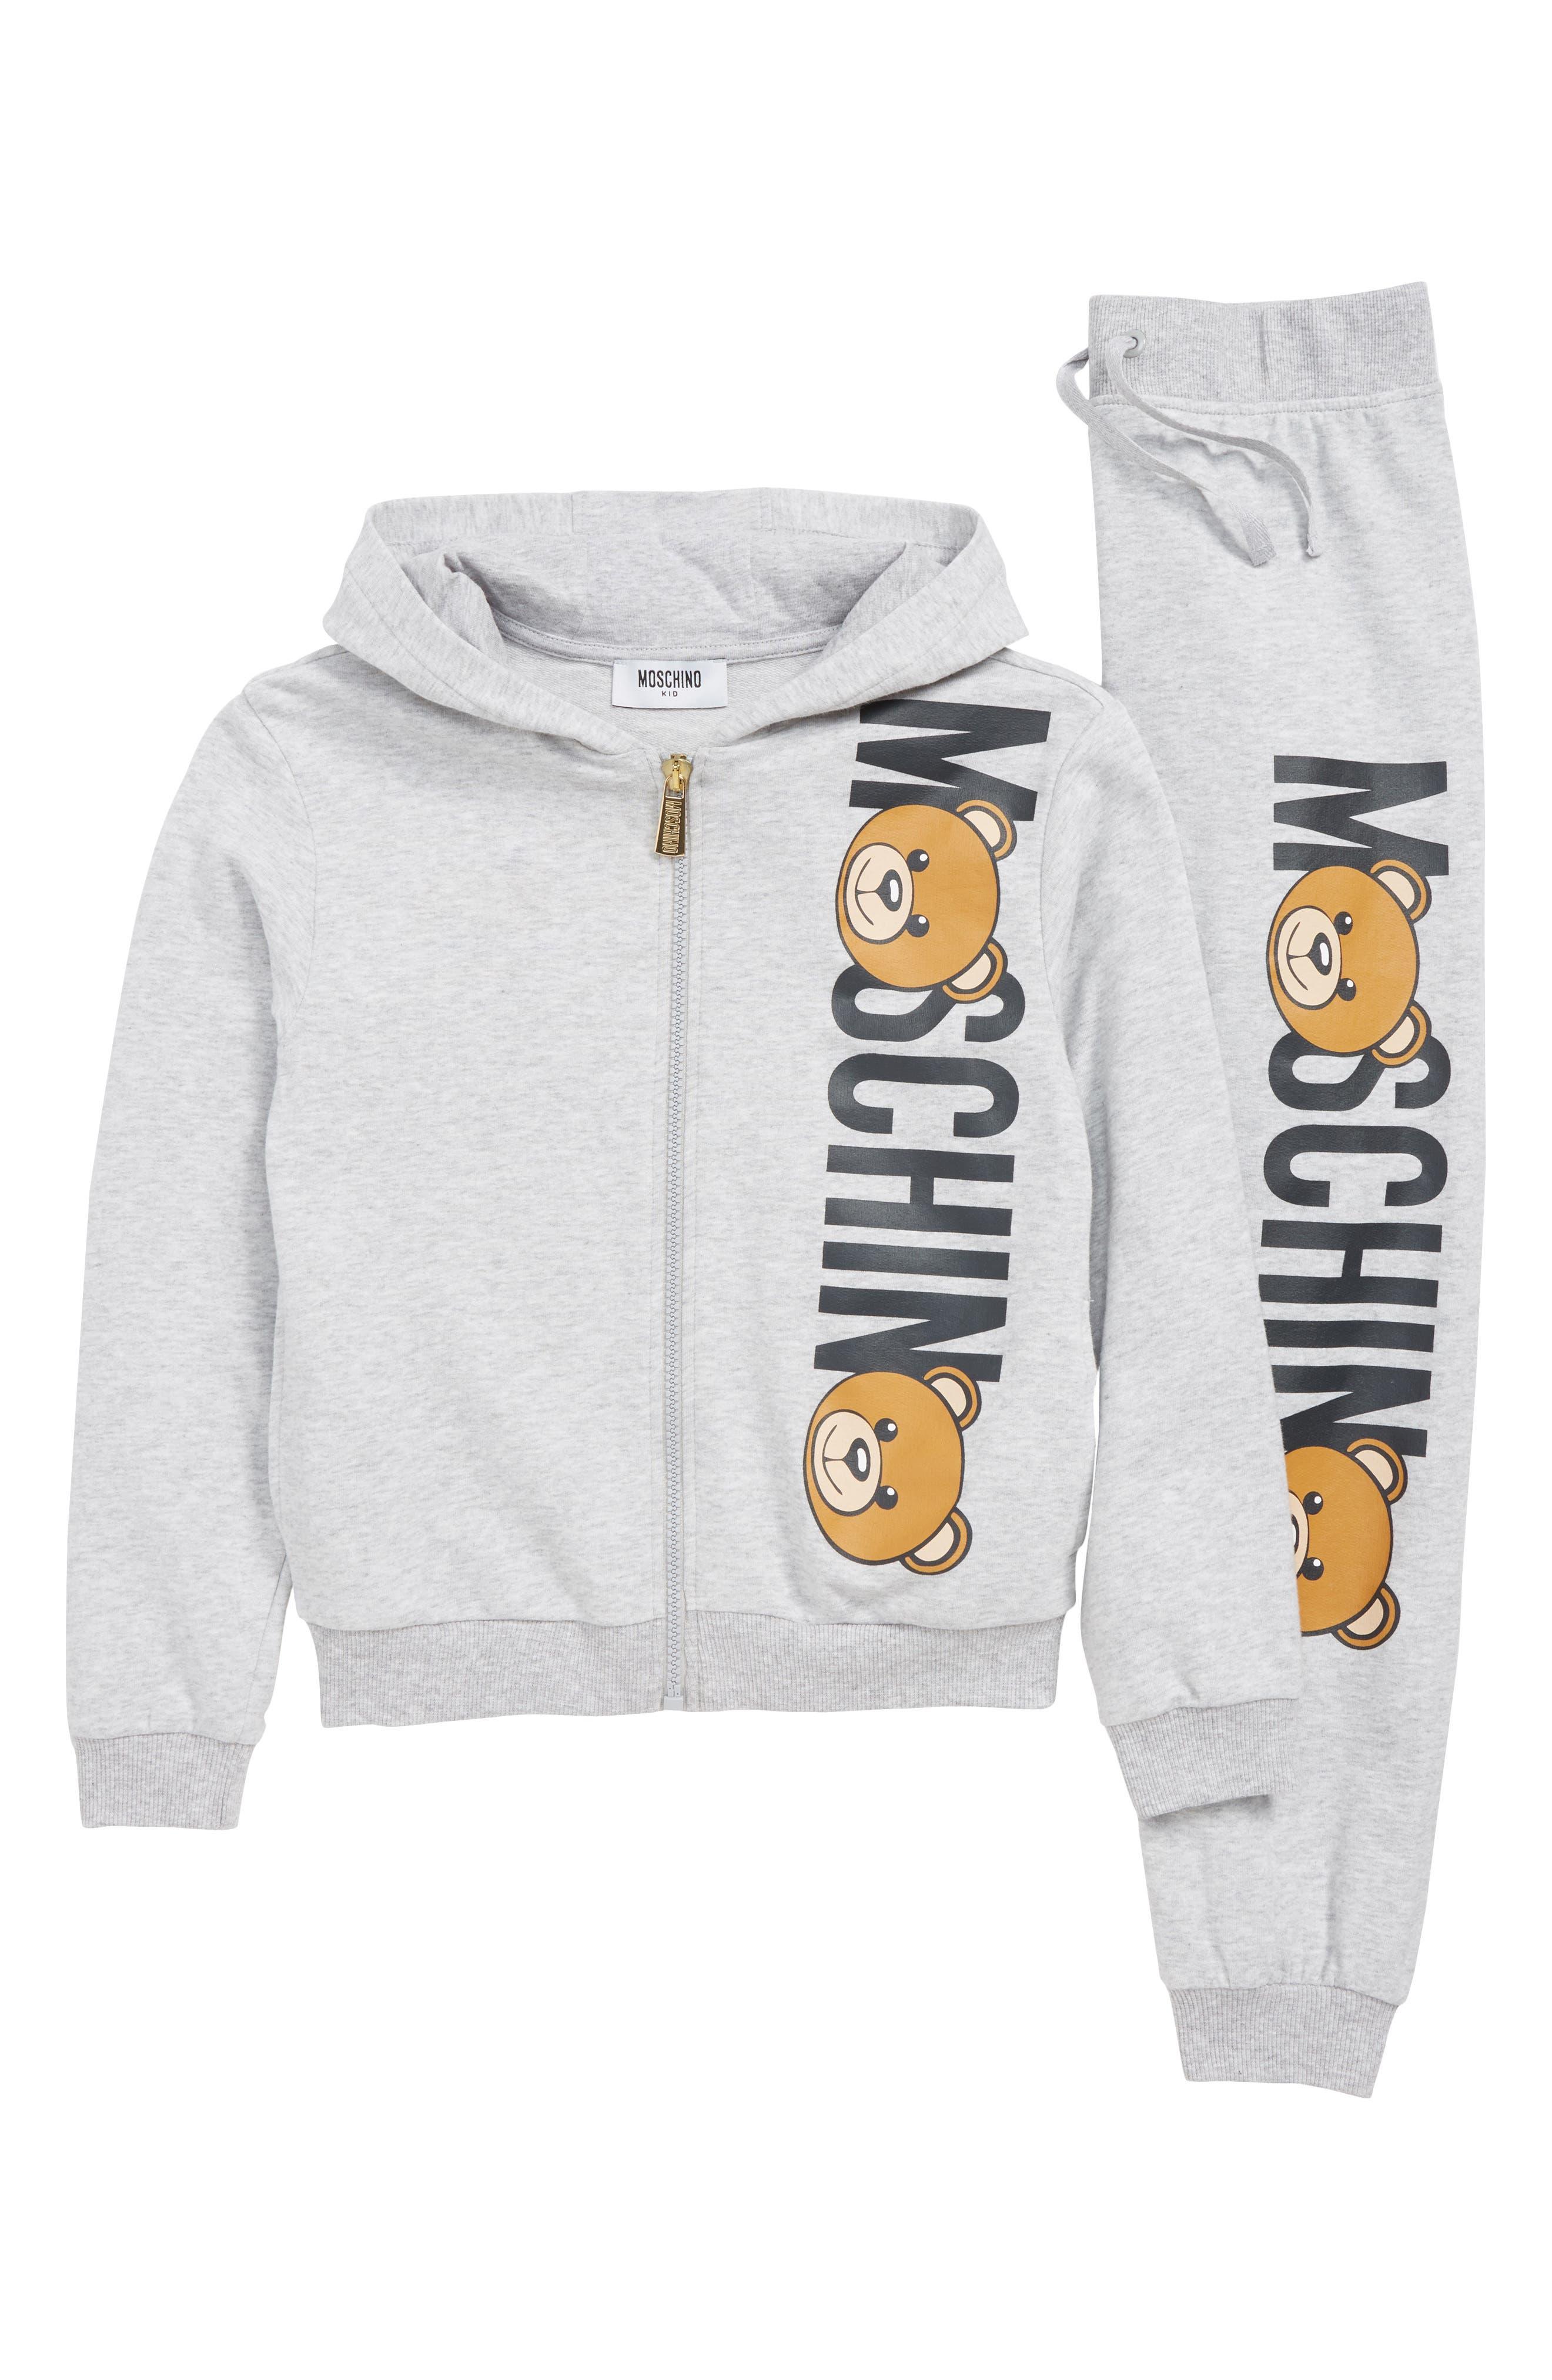 Toddler Moschino Logo Track Jacket  Jogger Pants Set Size 6Y  Grey